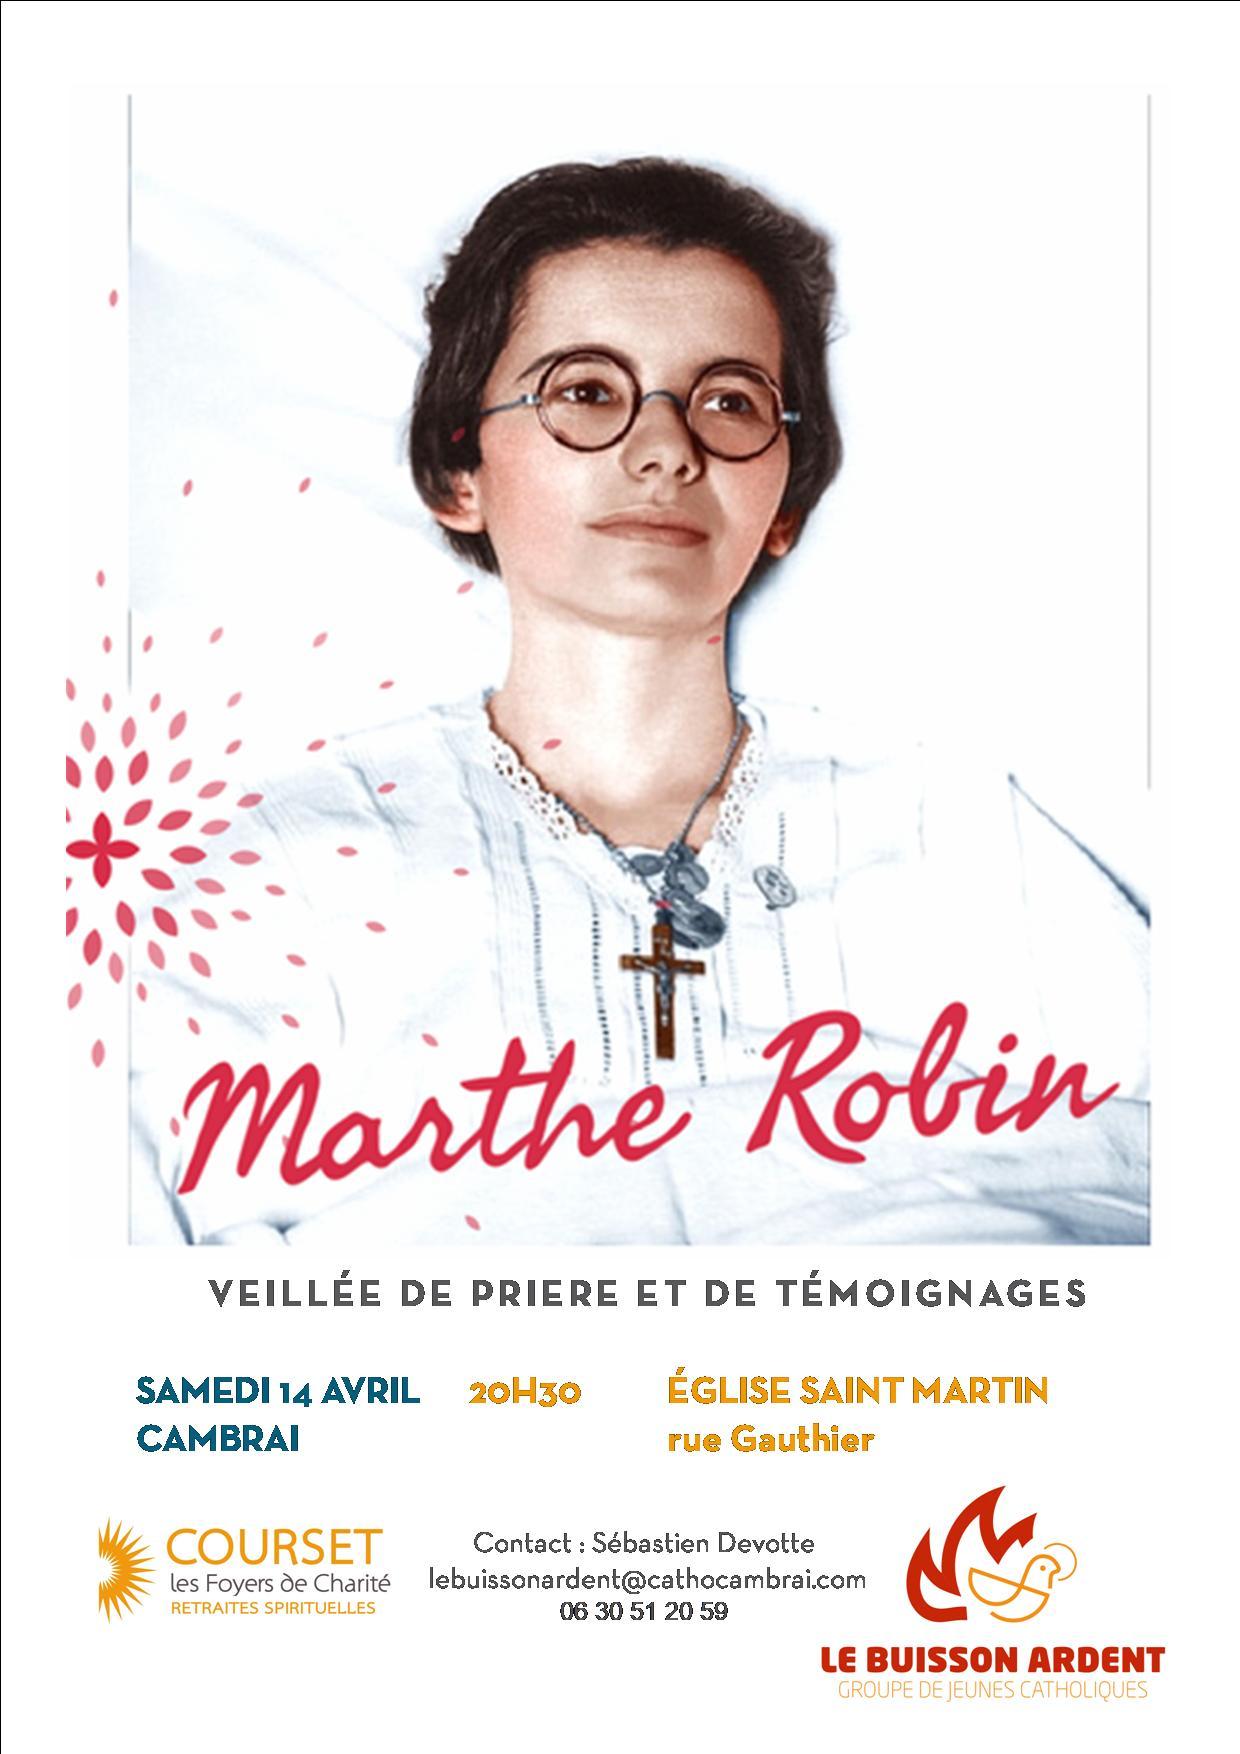 Veillée Marthe Robin à Cambrai